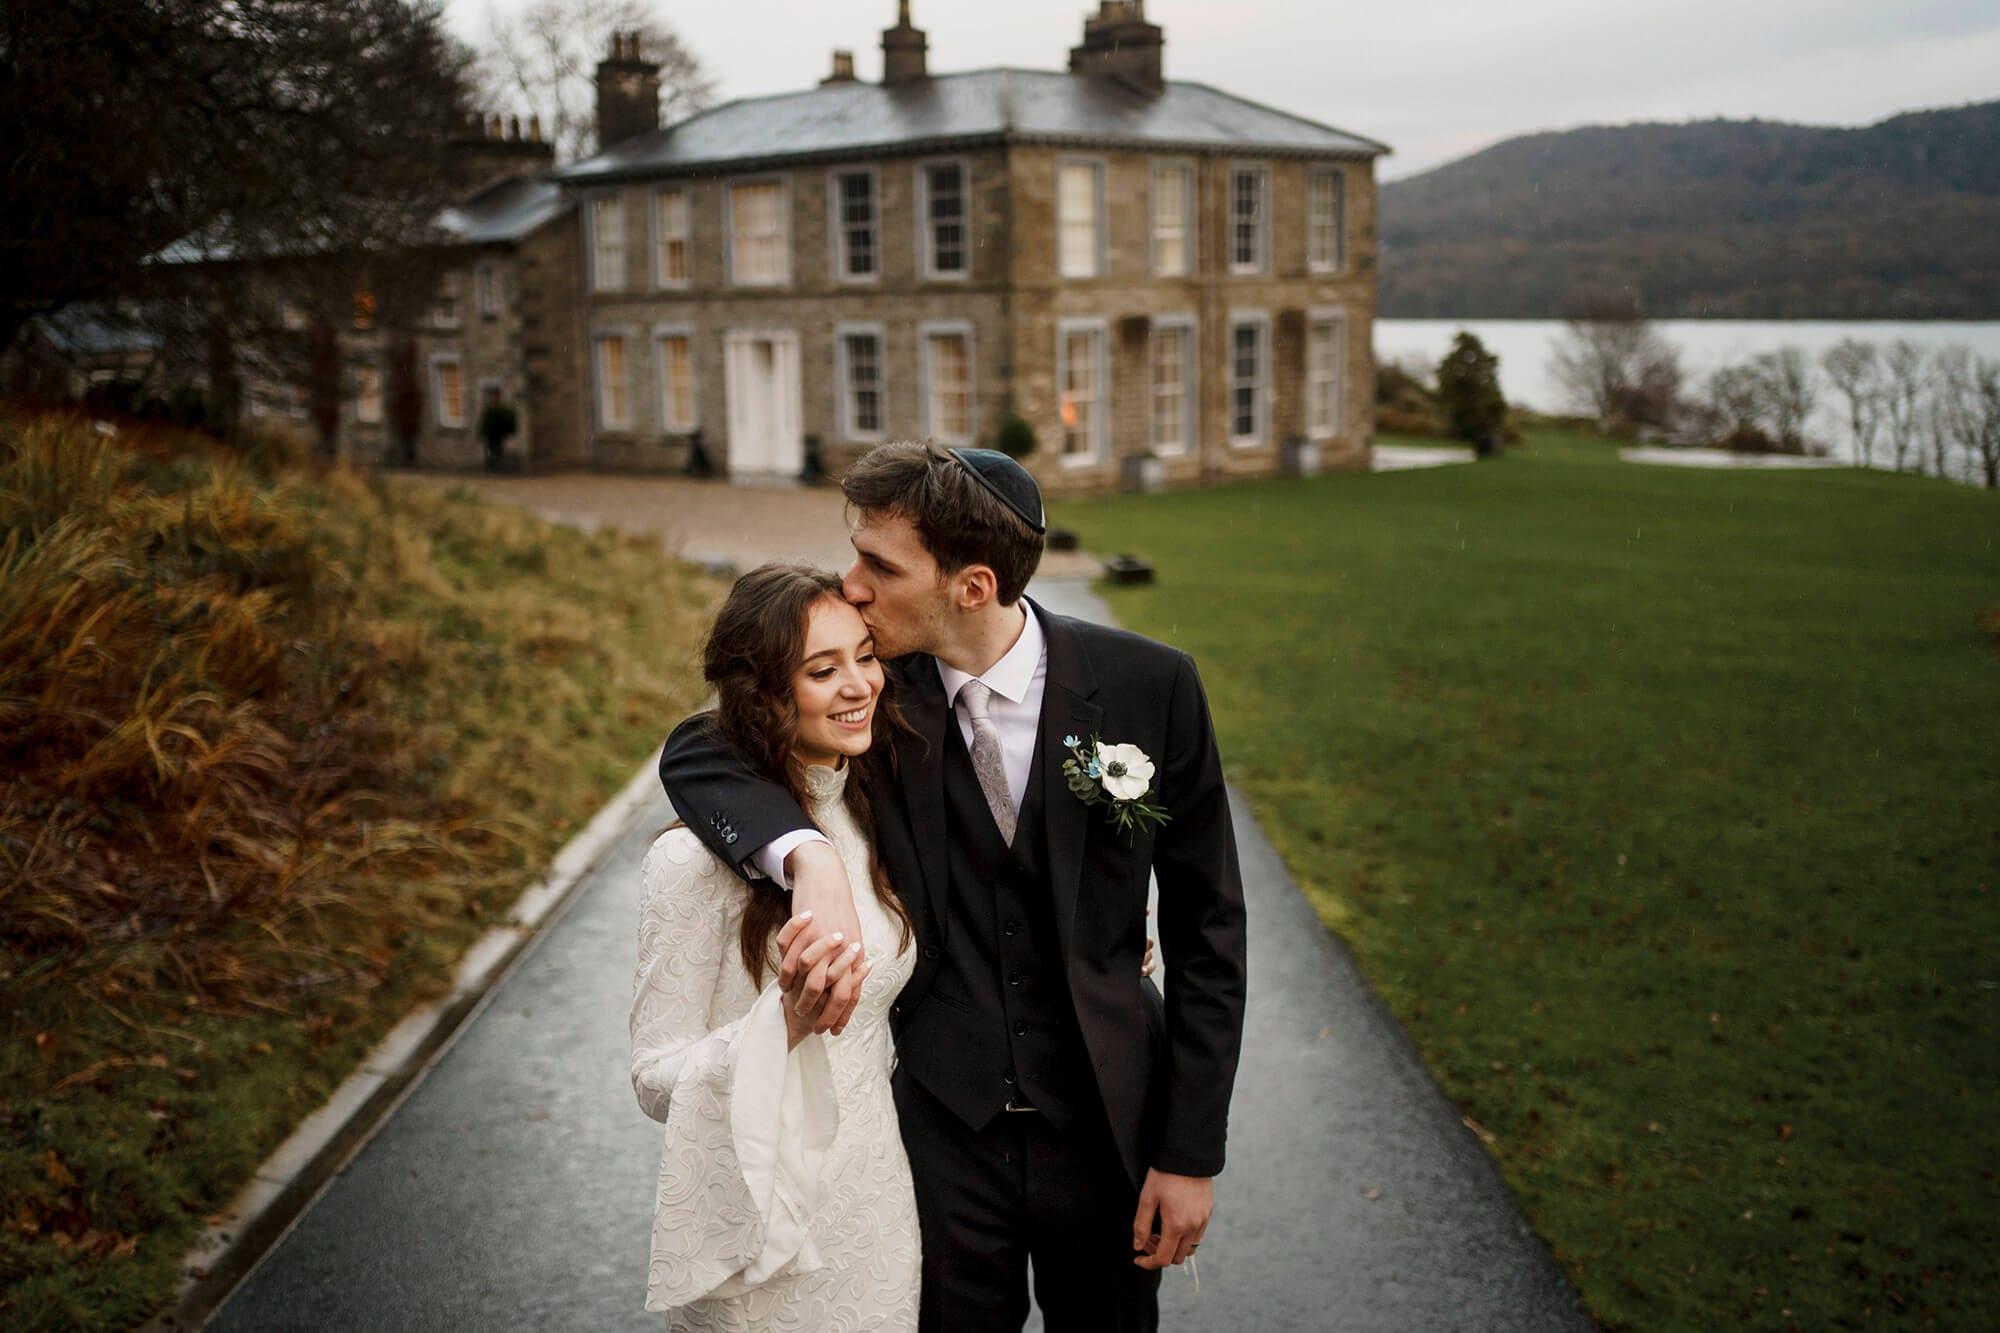 Top UK Wedding Venues For 2022